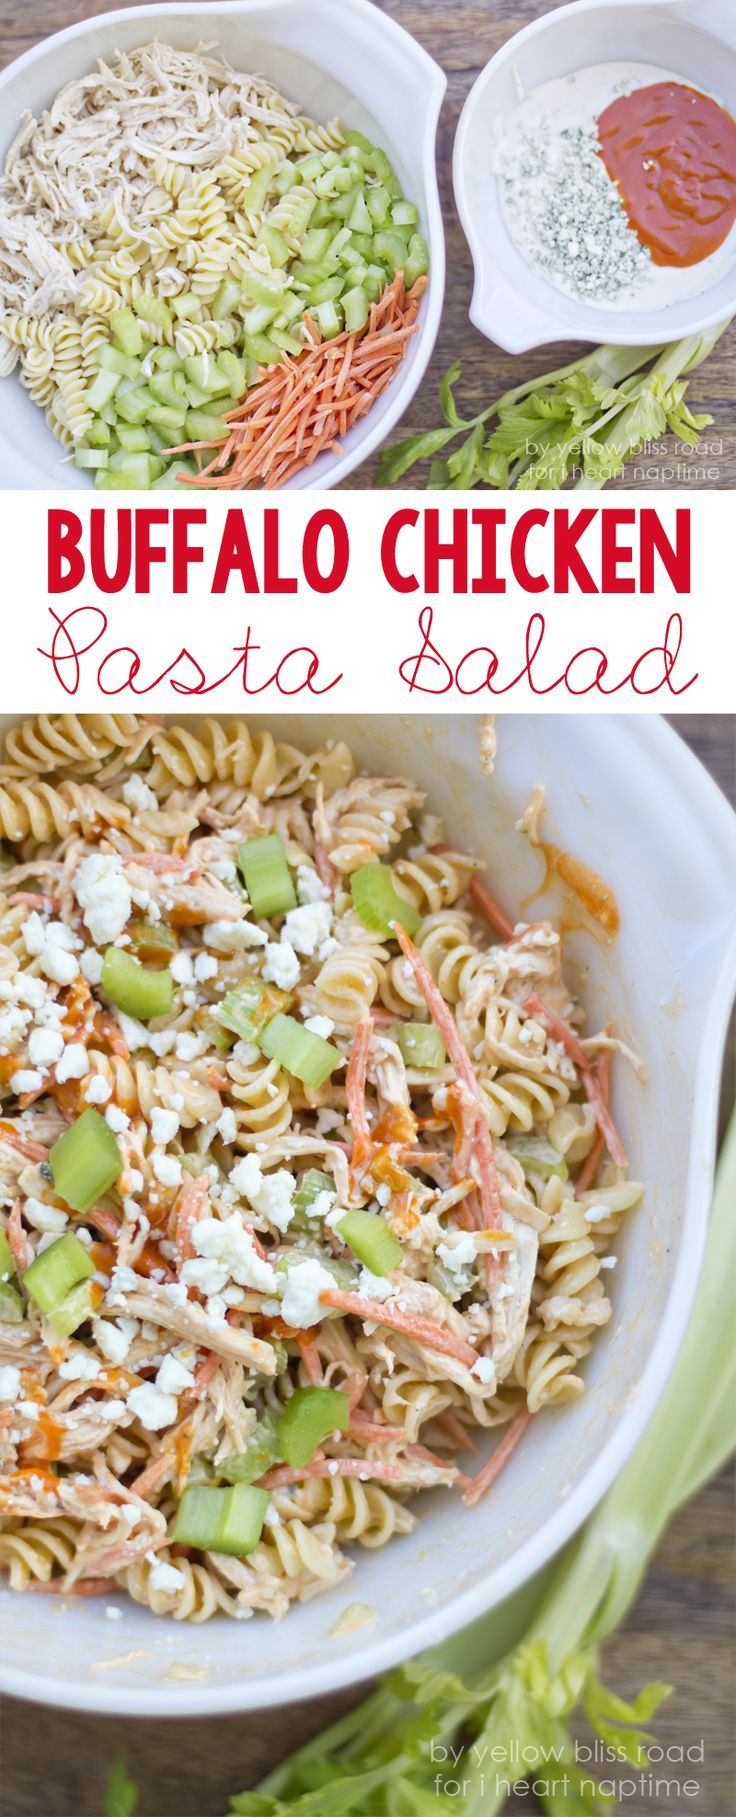 Buffalo Chicken Pasta Salad Recipe ...looks easy and delicious!